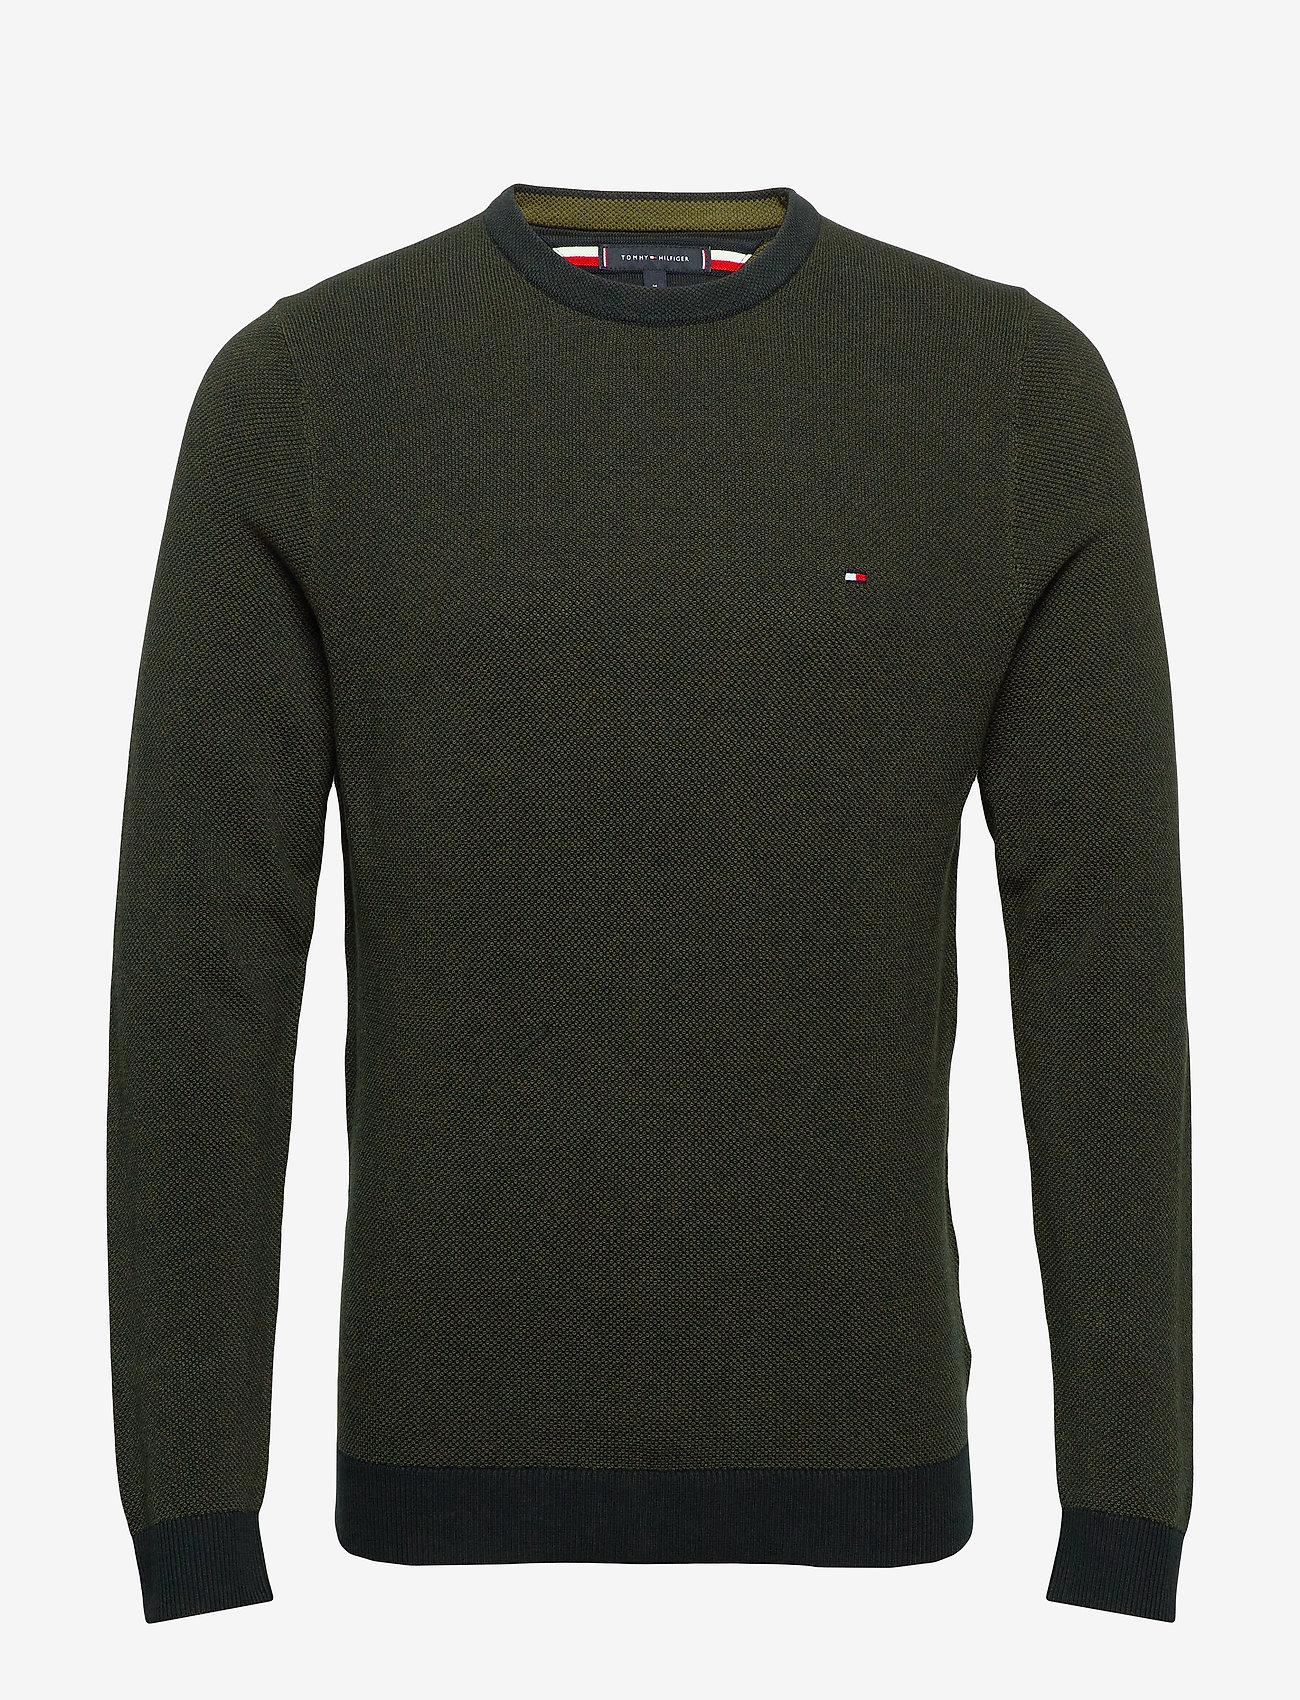 Tommy Hilfiger - MOULINE STRUCTURE CREW NECK - tricots basiques - camo green - 0